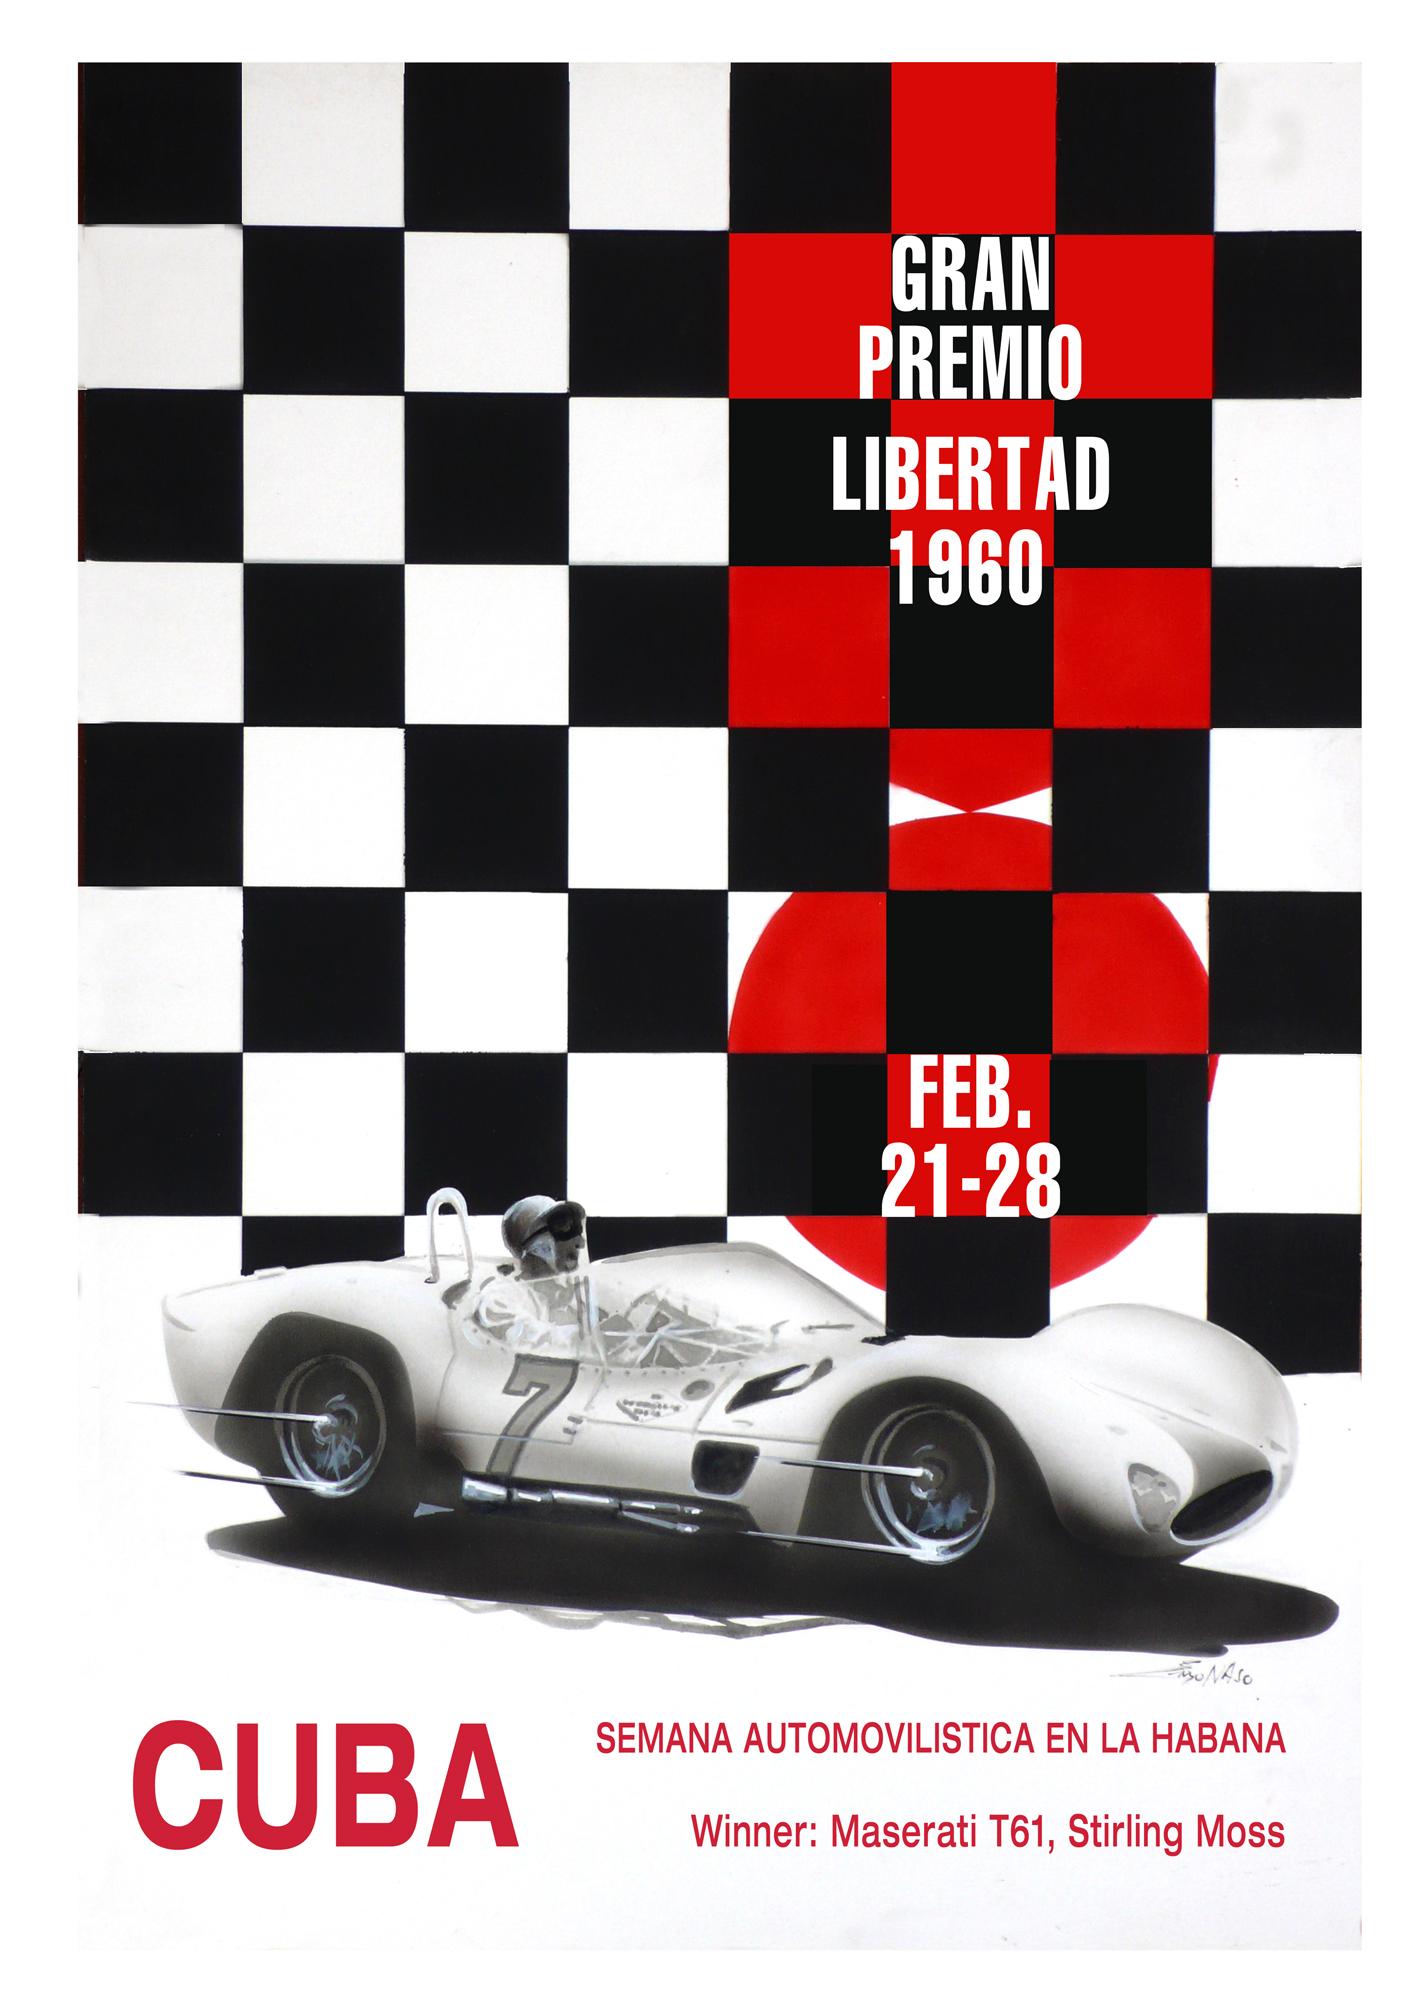 Centenario Maserati GP - Cuba 1960